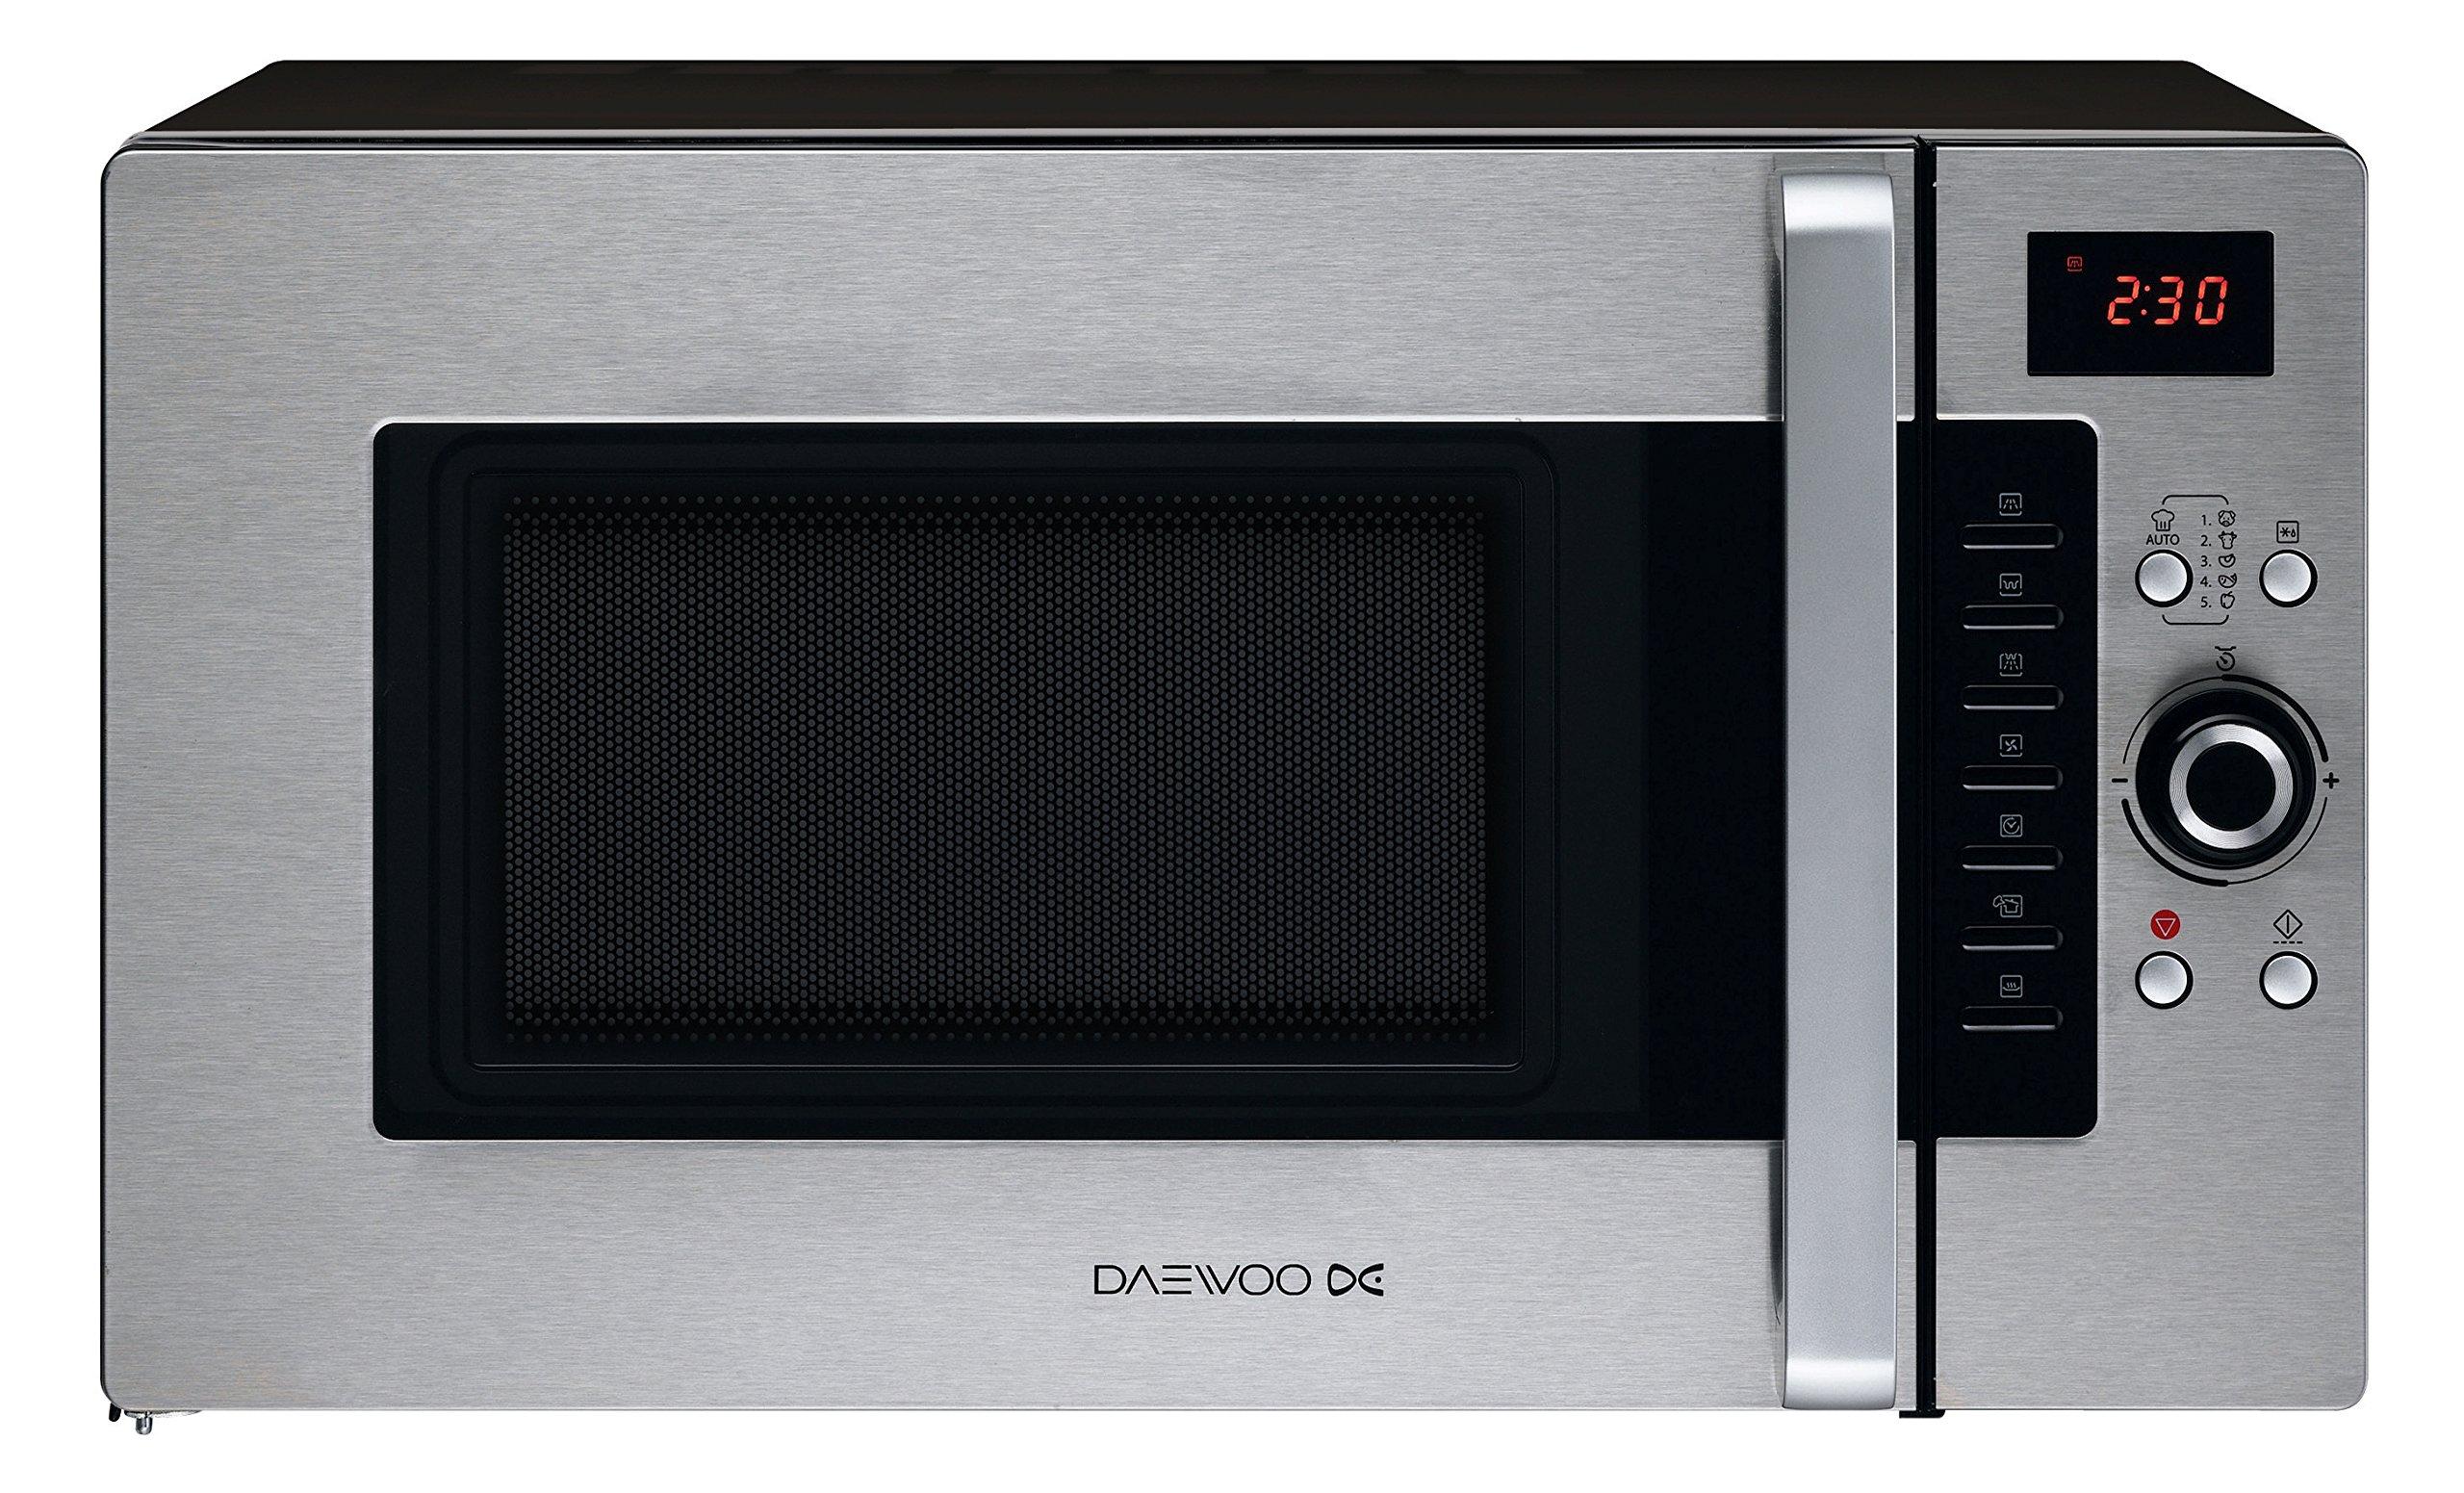 Daewoo KOC-9Q4T Microondas, 28 litros, Digital, Grill, Acero Inoxidable, 900 W, INOX product image